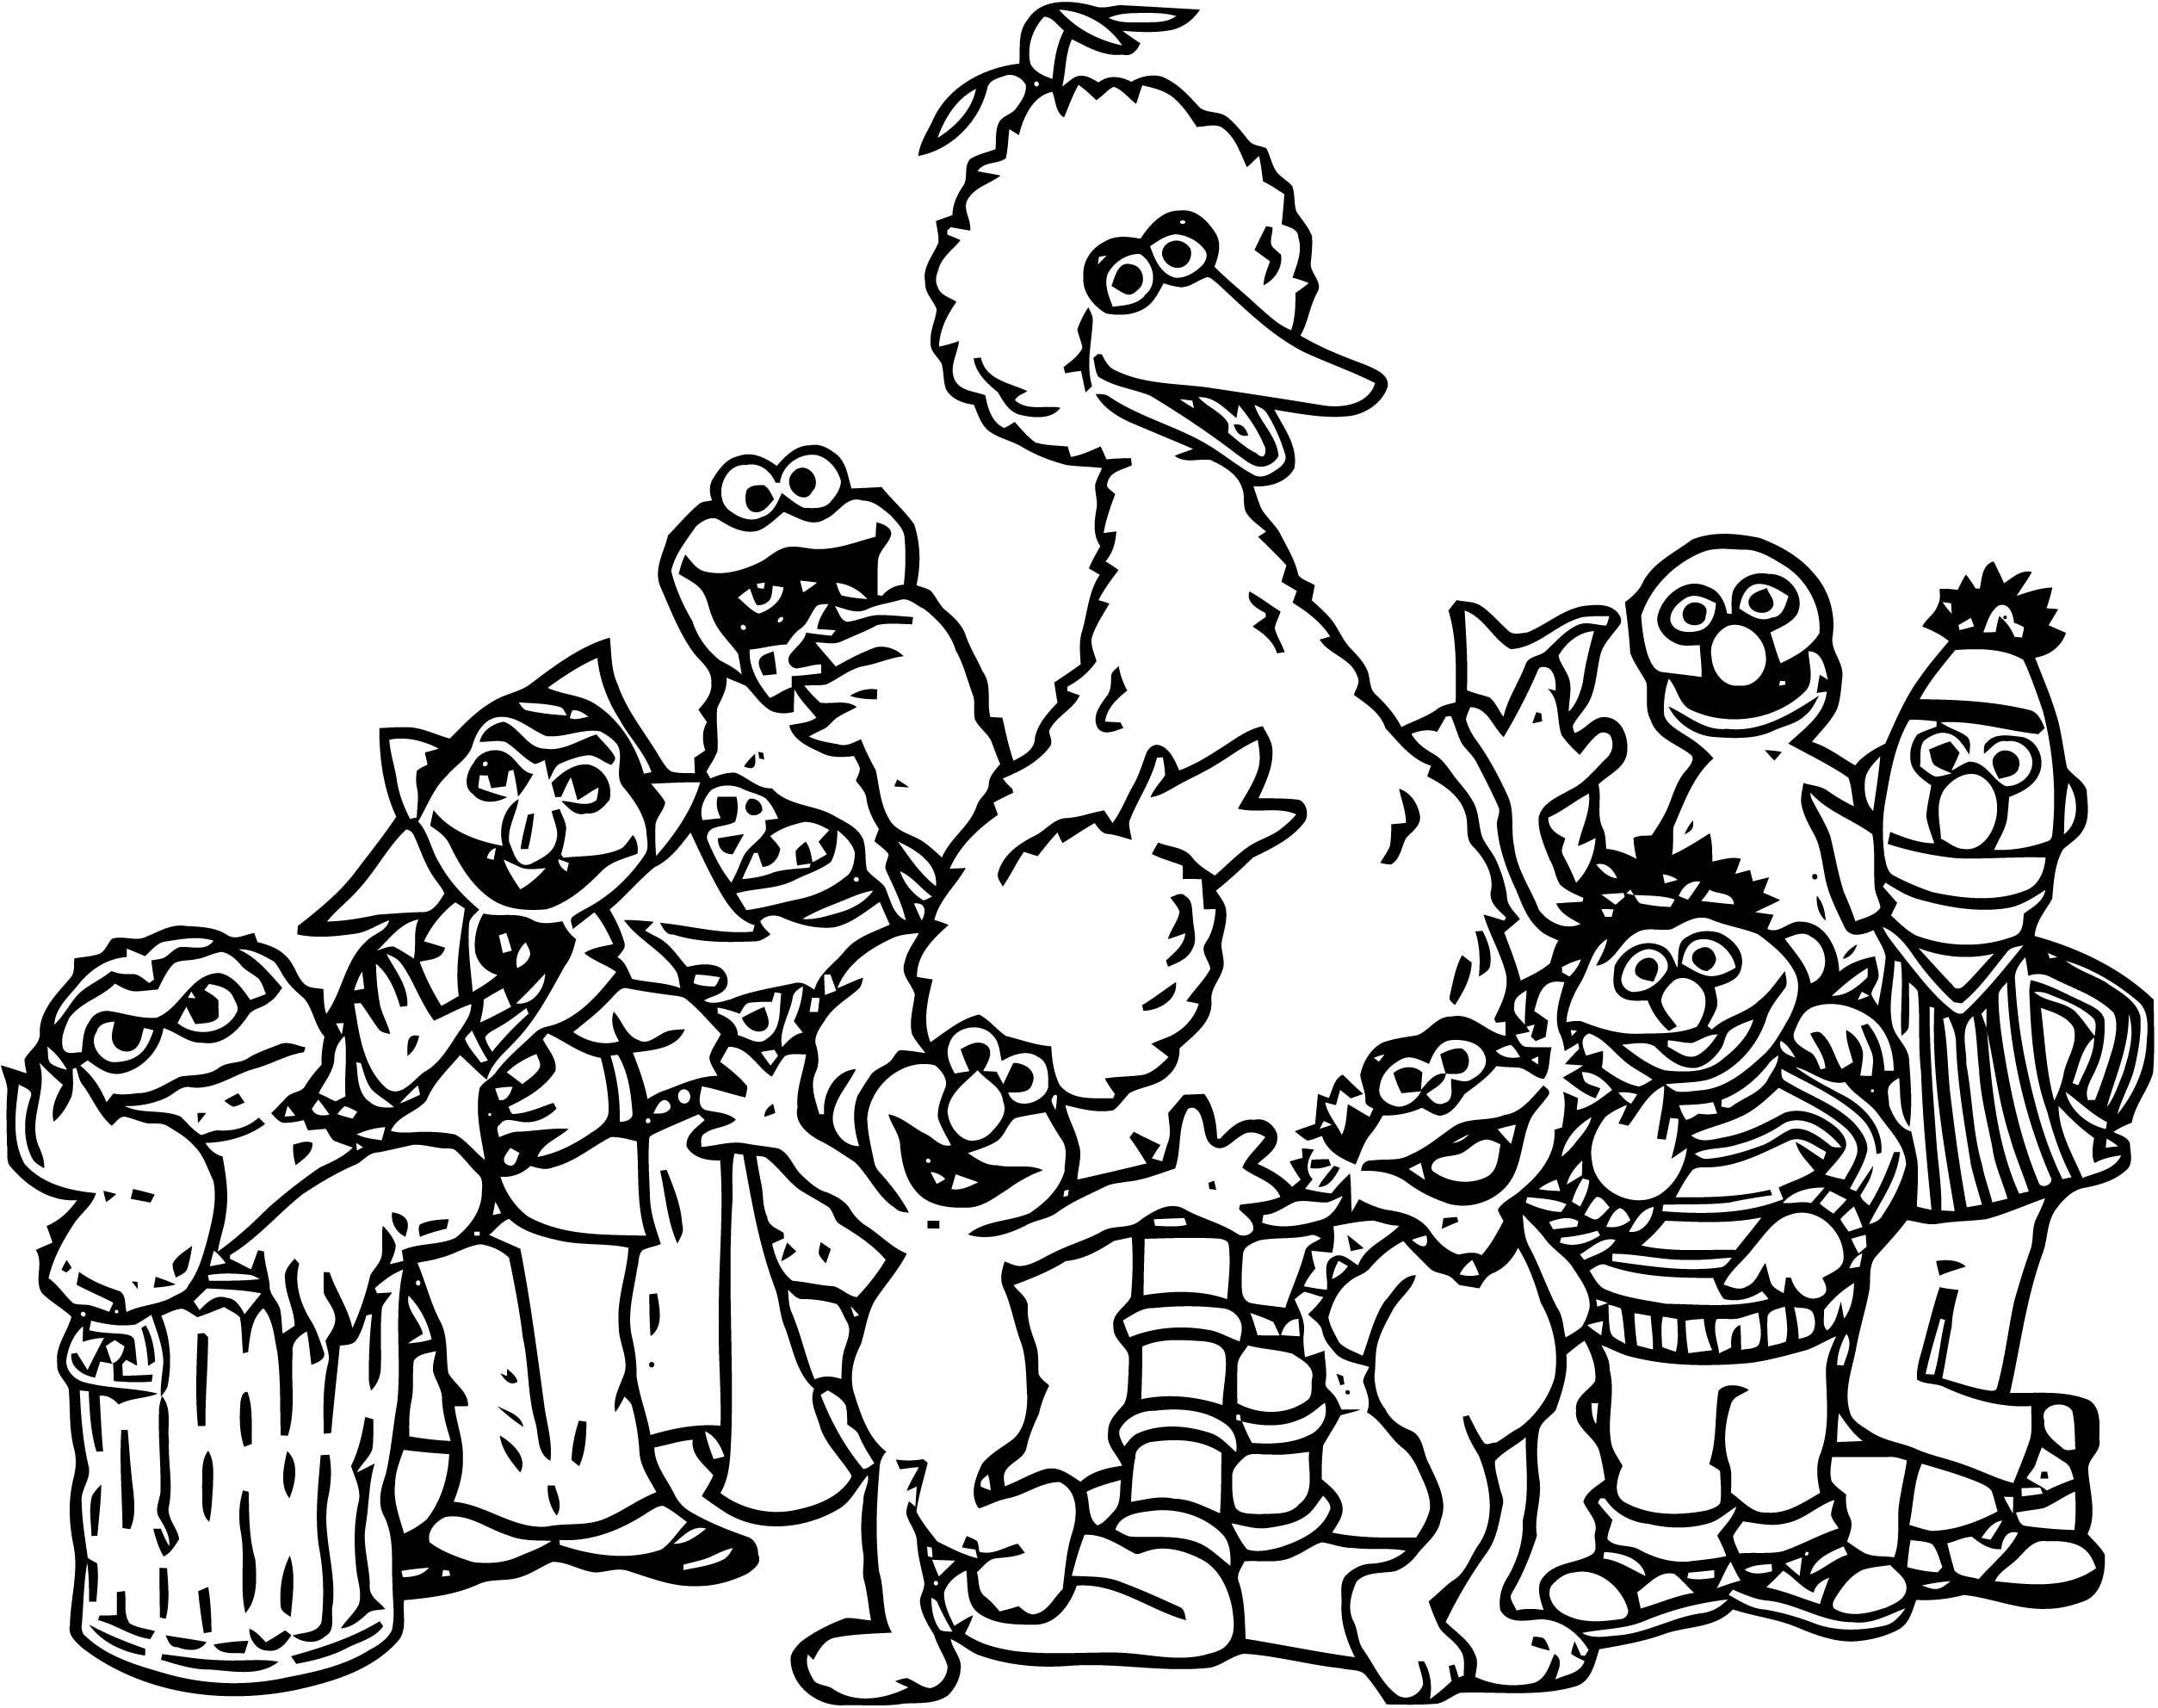 Sesame Street Elmo Coloring Page WeColoringPage 40 | Wecoloringpage.com